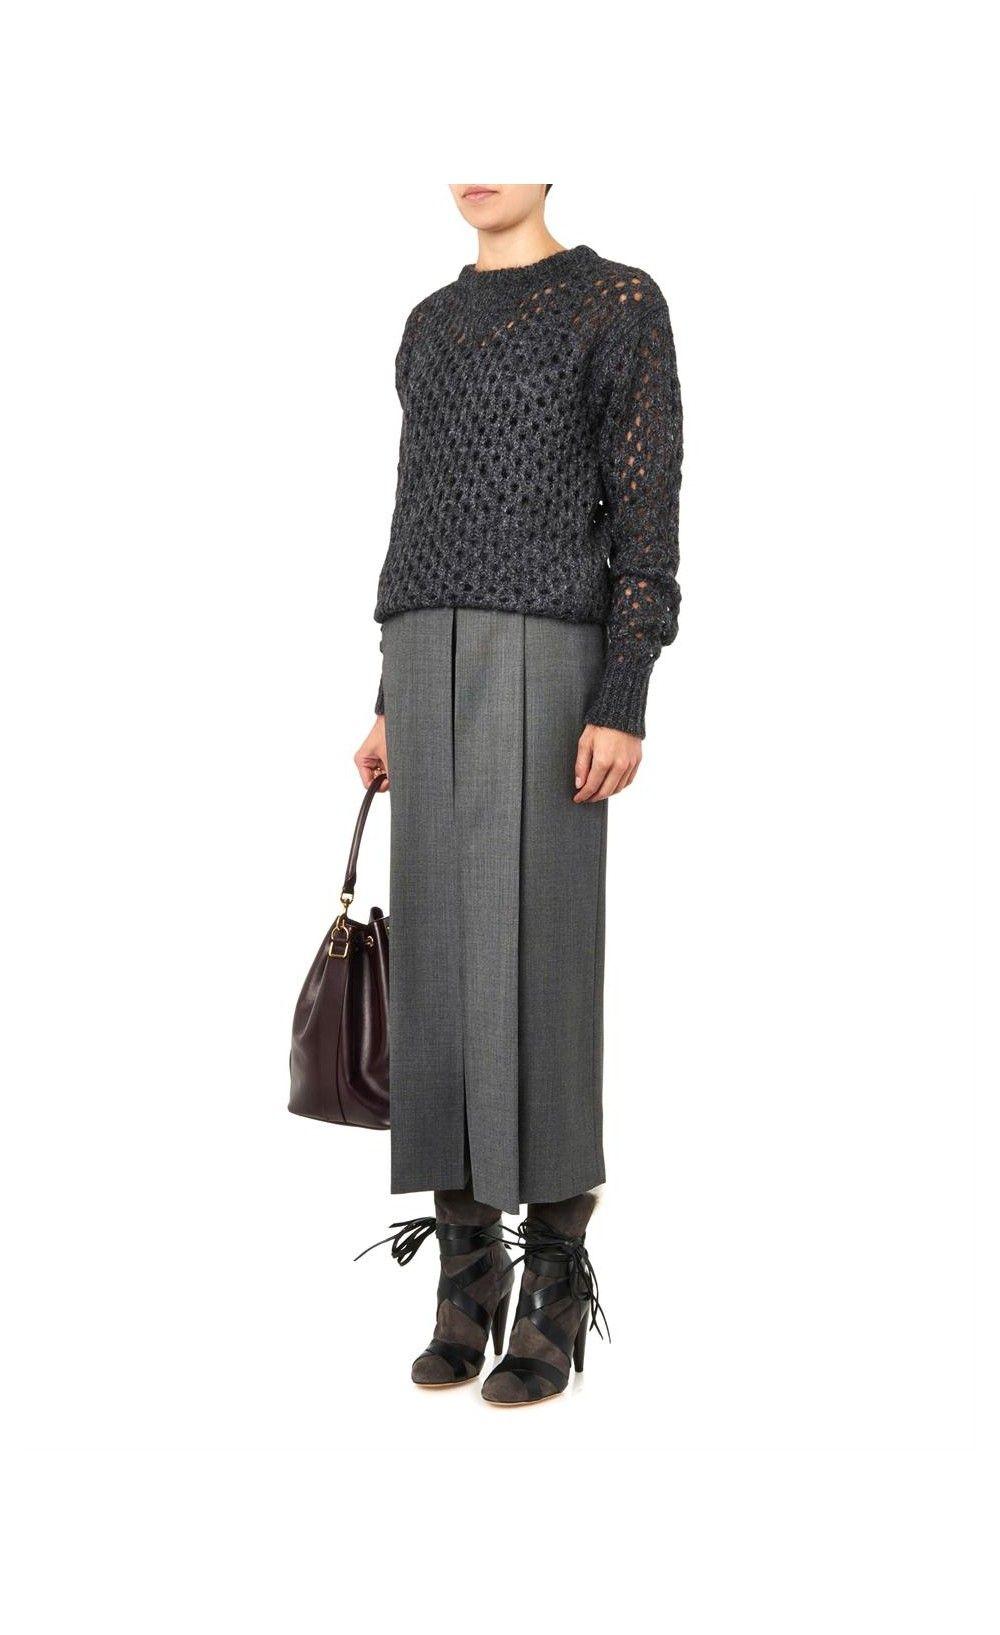 Isabel Marant Neta Fur-Trimmed Suede Boots - Isabel Marant #inspiration #BlackFriday #IM